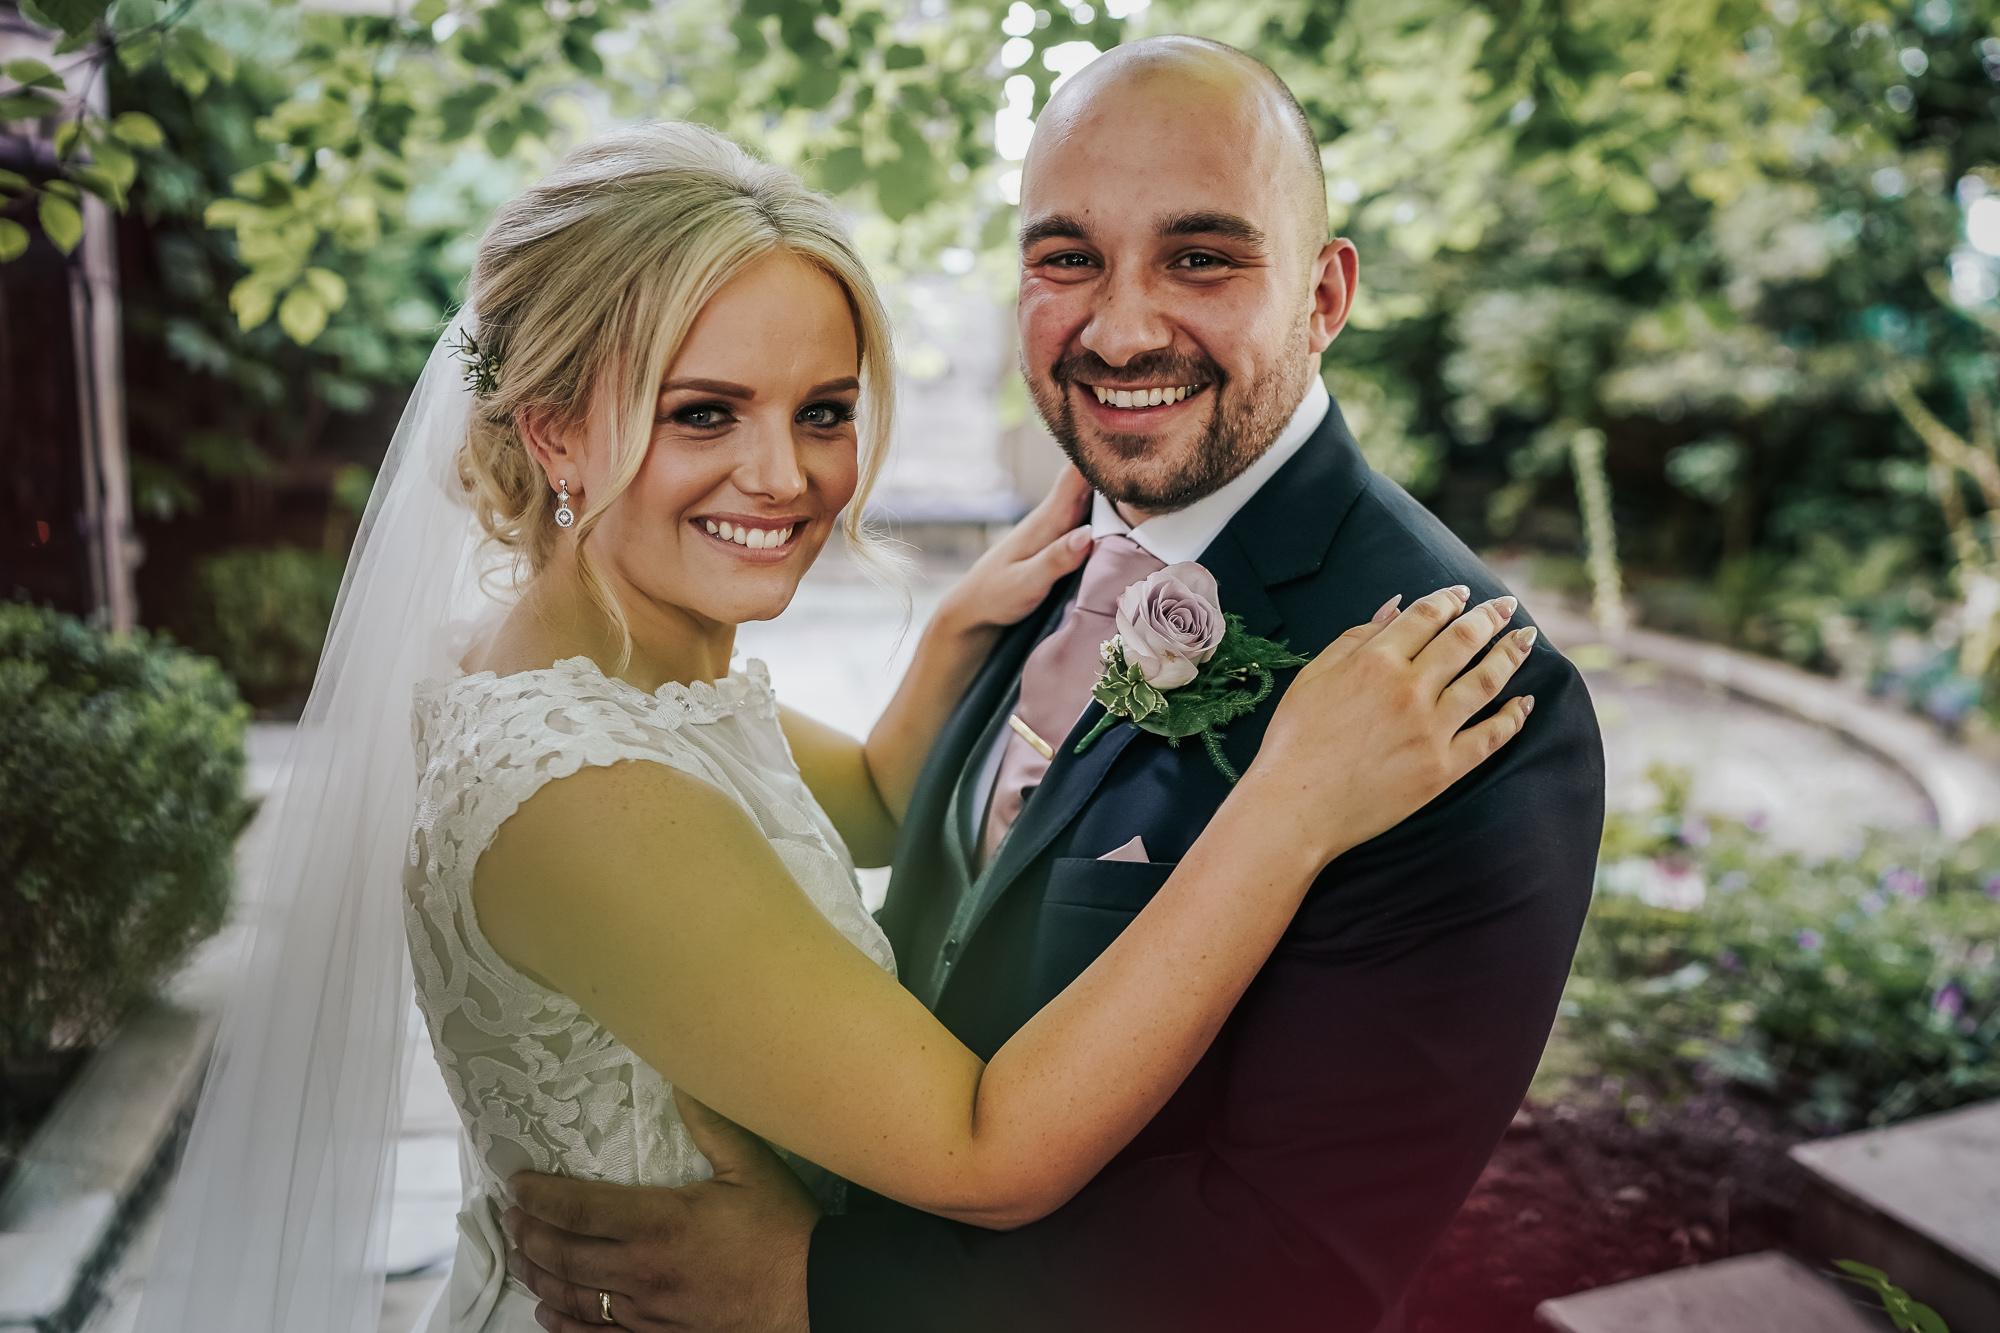 West Tower Wedding Photographer Ormskirk Lancashire wedding photography (38 of 57).jpg